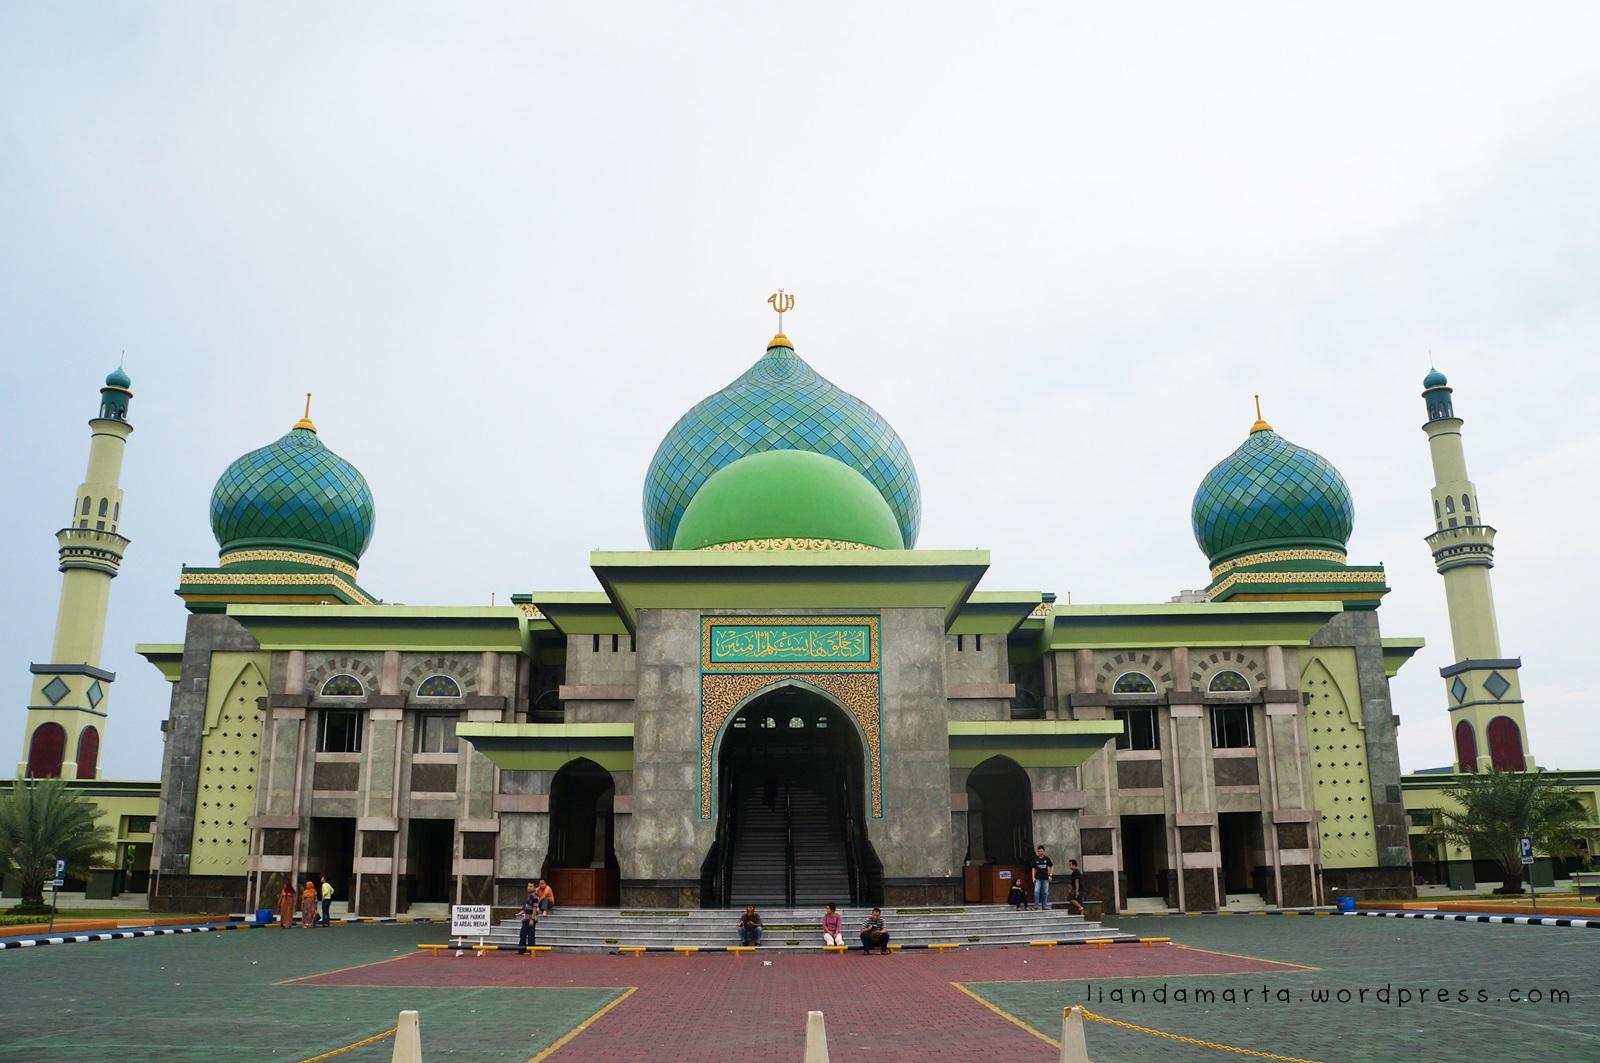 Wisata Rohani Masjid Agung Annur Riau Backpacker Jakarta Foto Liandamarta